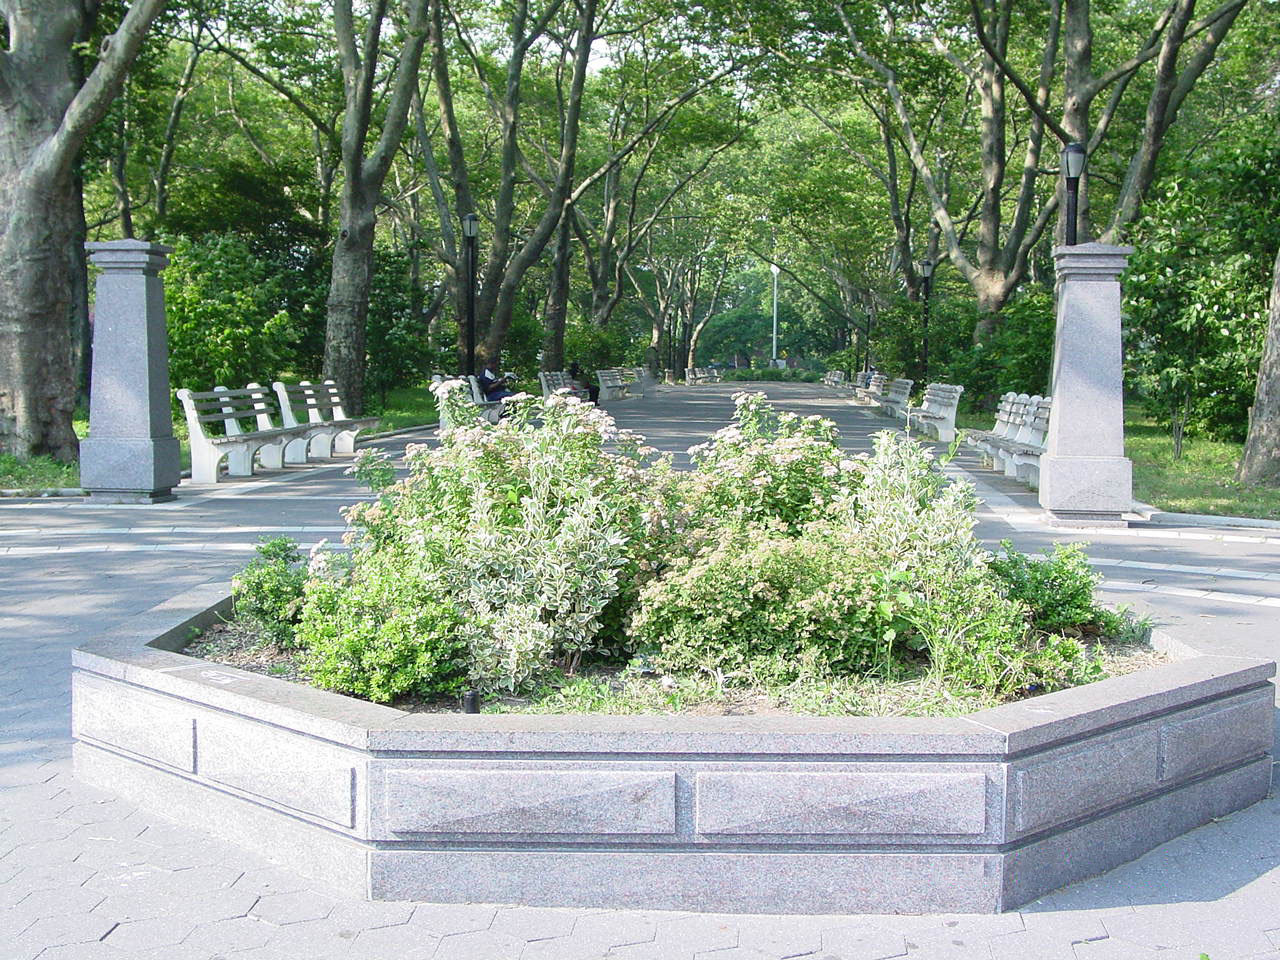 Baisleys Pond Park, Queens NY